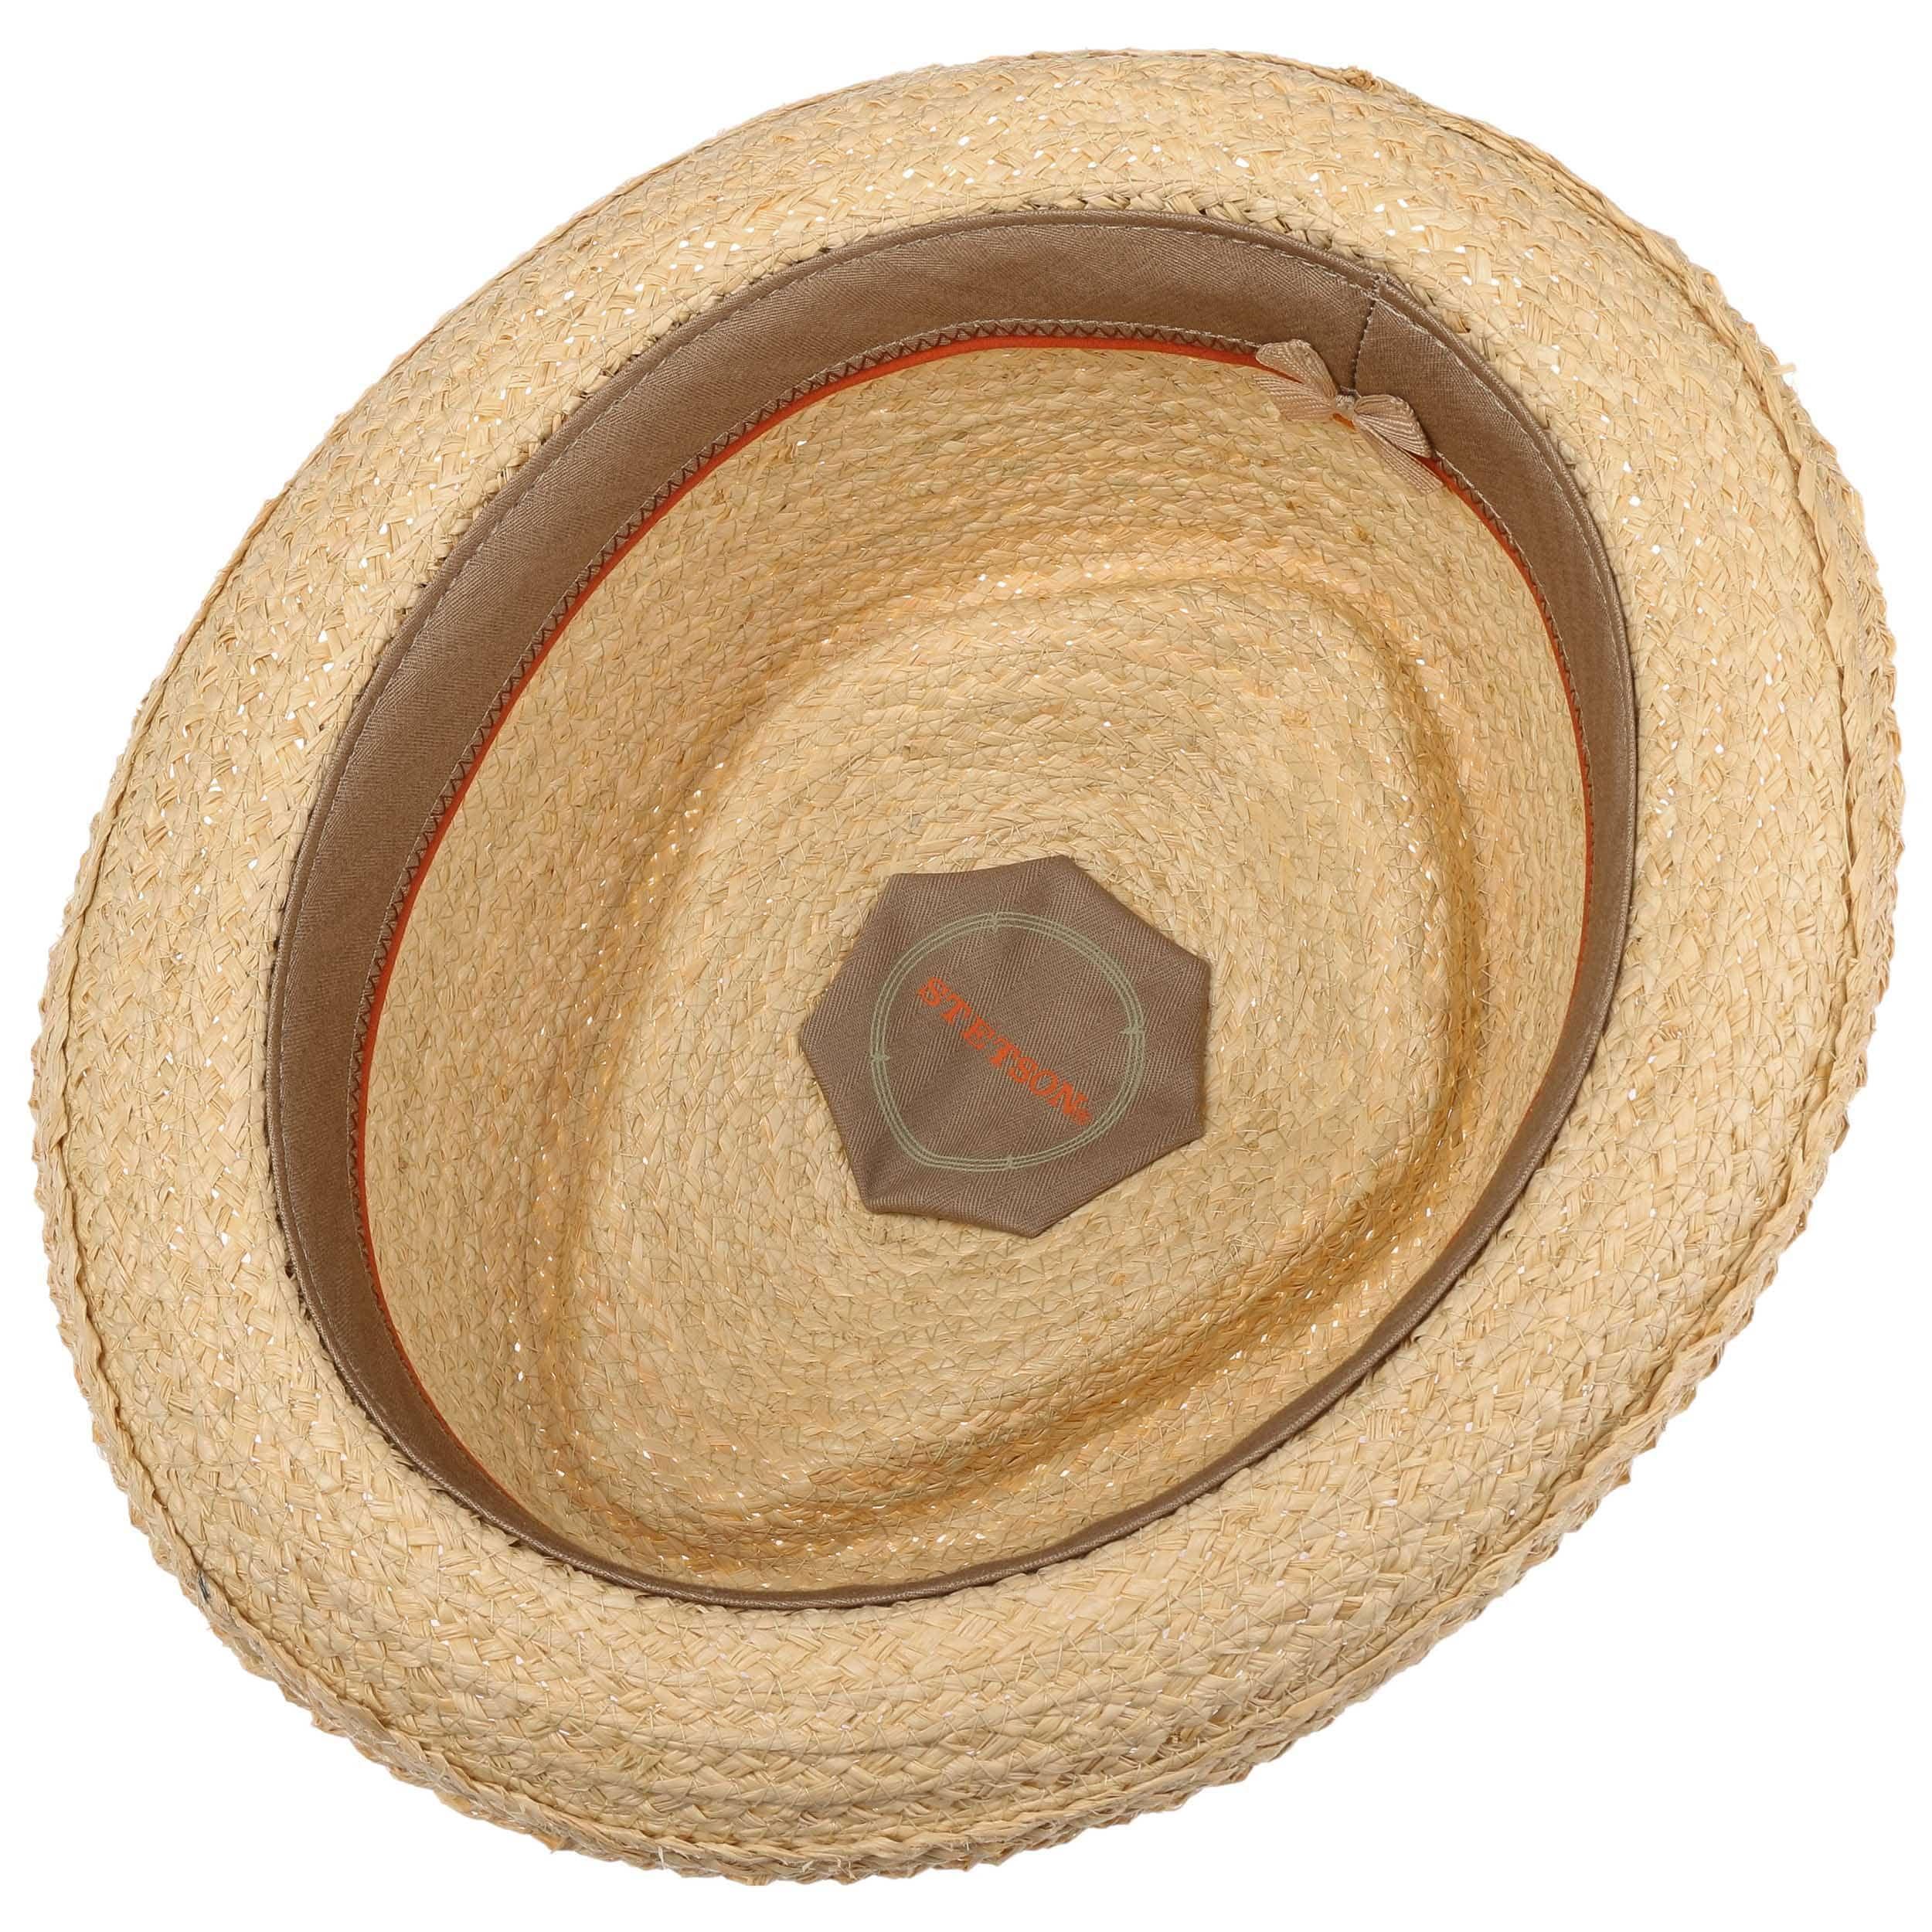 Salango Diamond Raffiahut natur